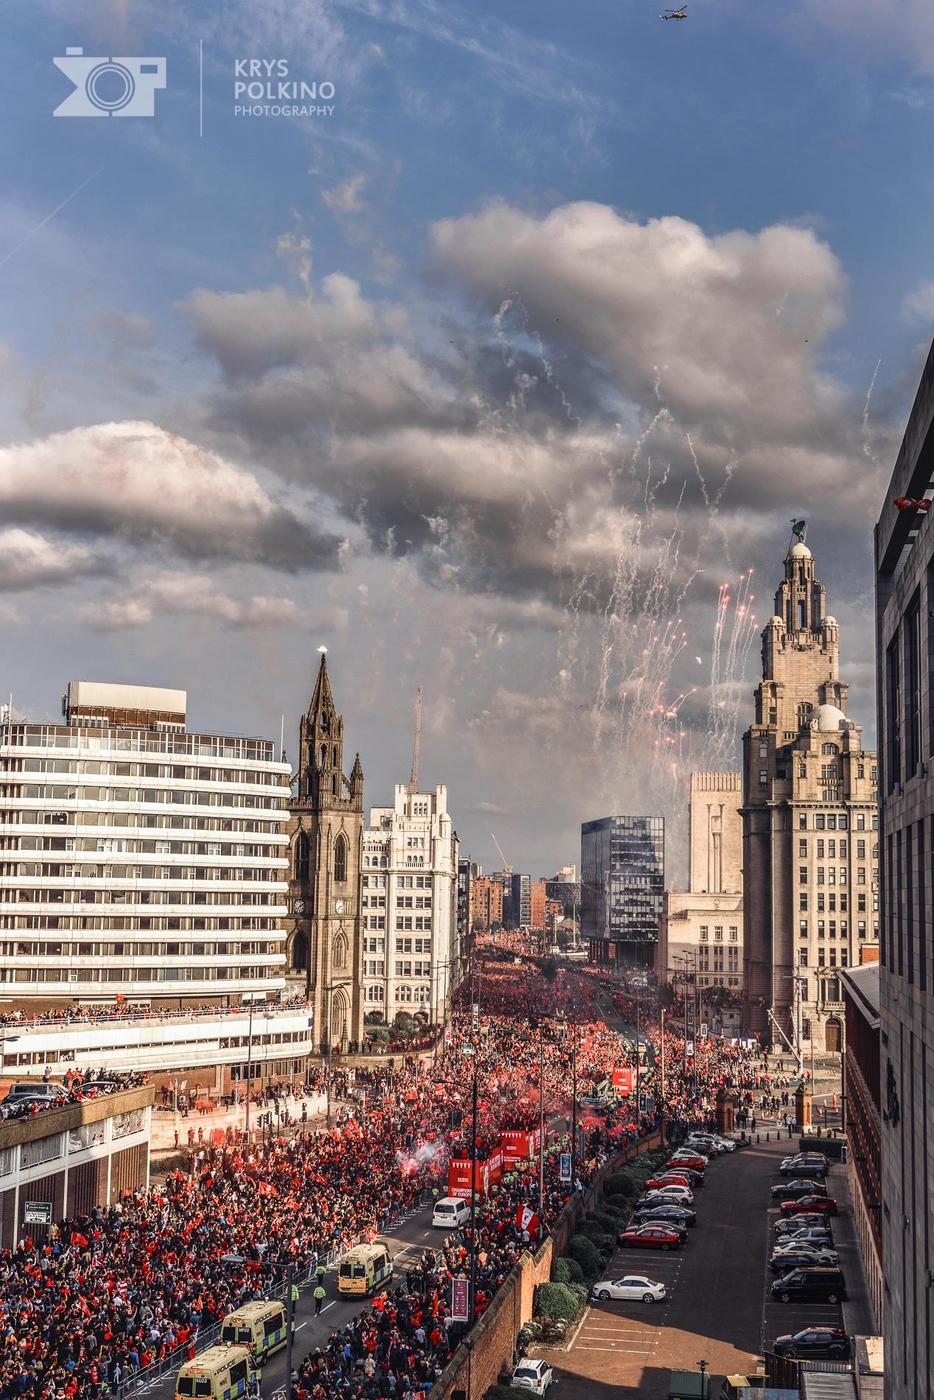 My Liverpool Champions Legue 2019 parade.